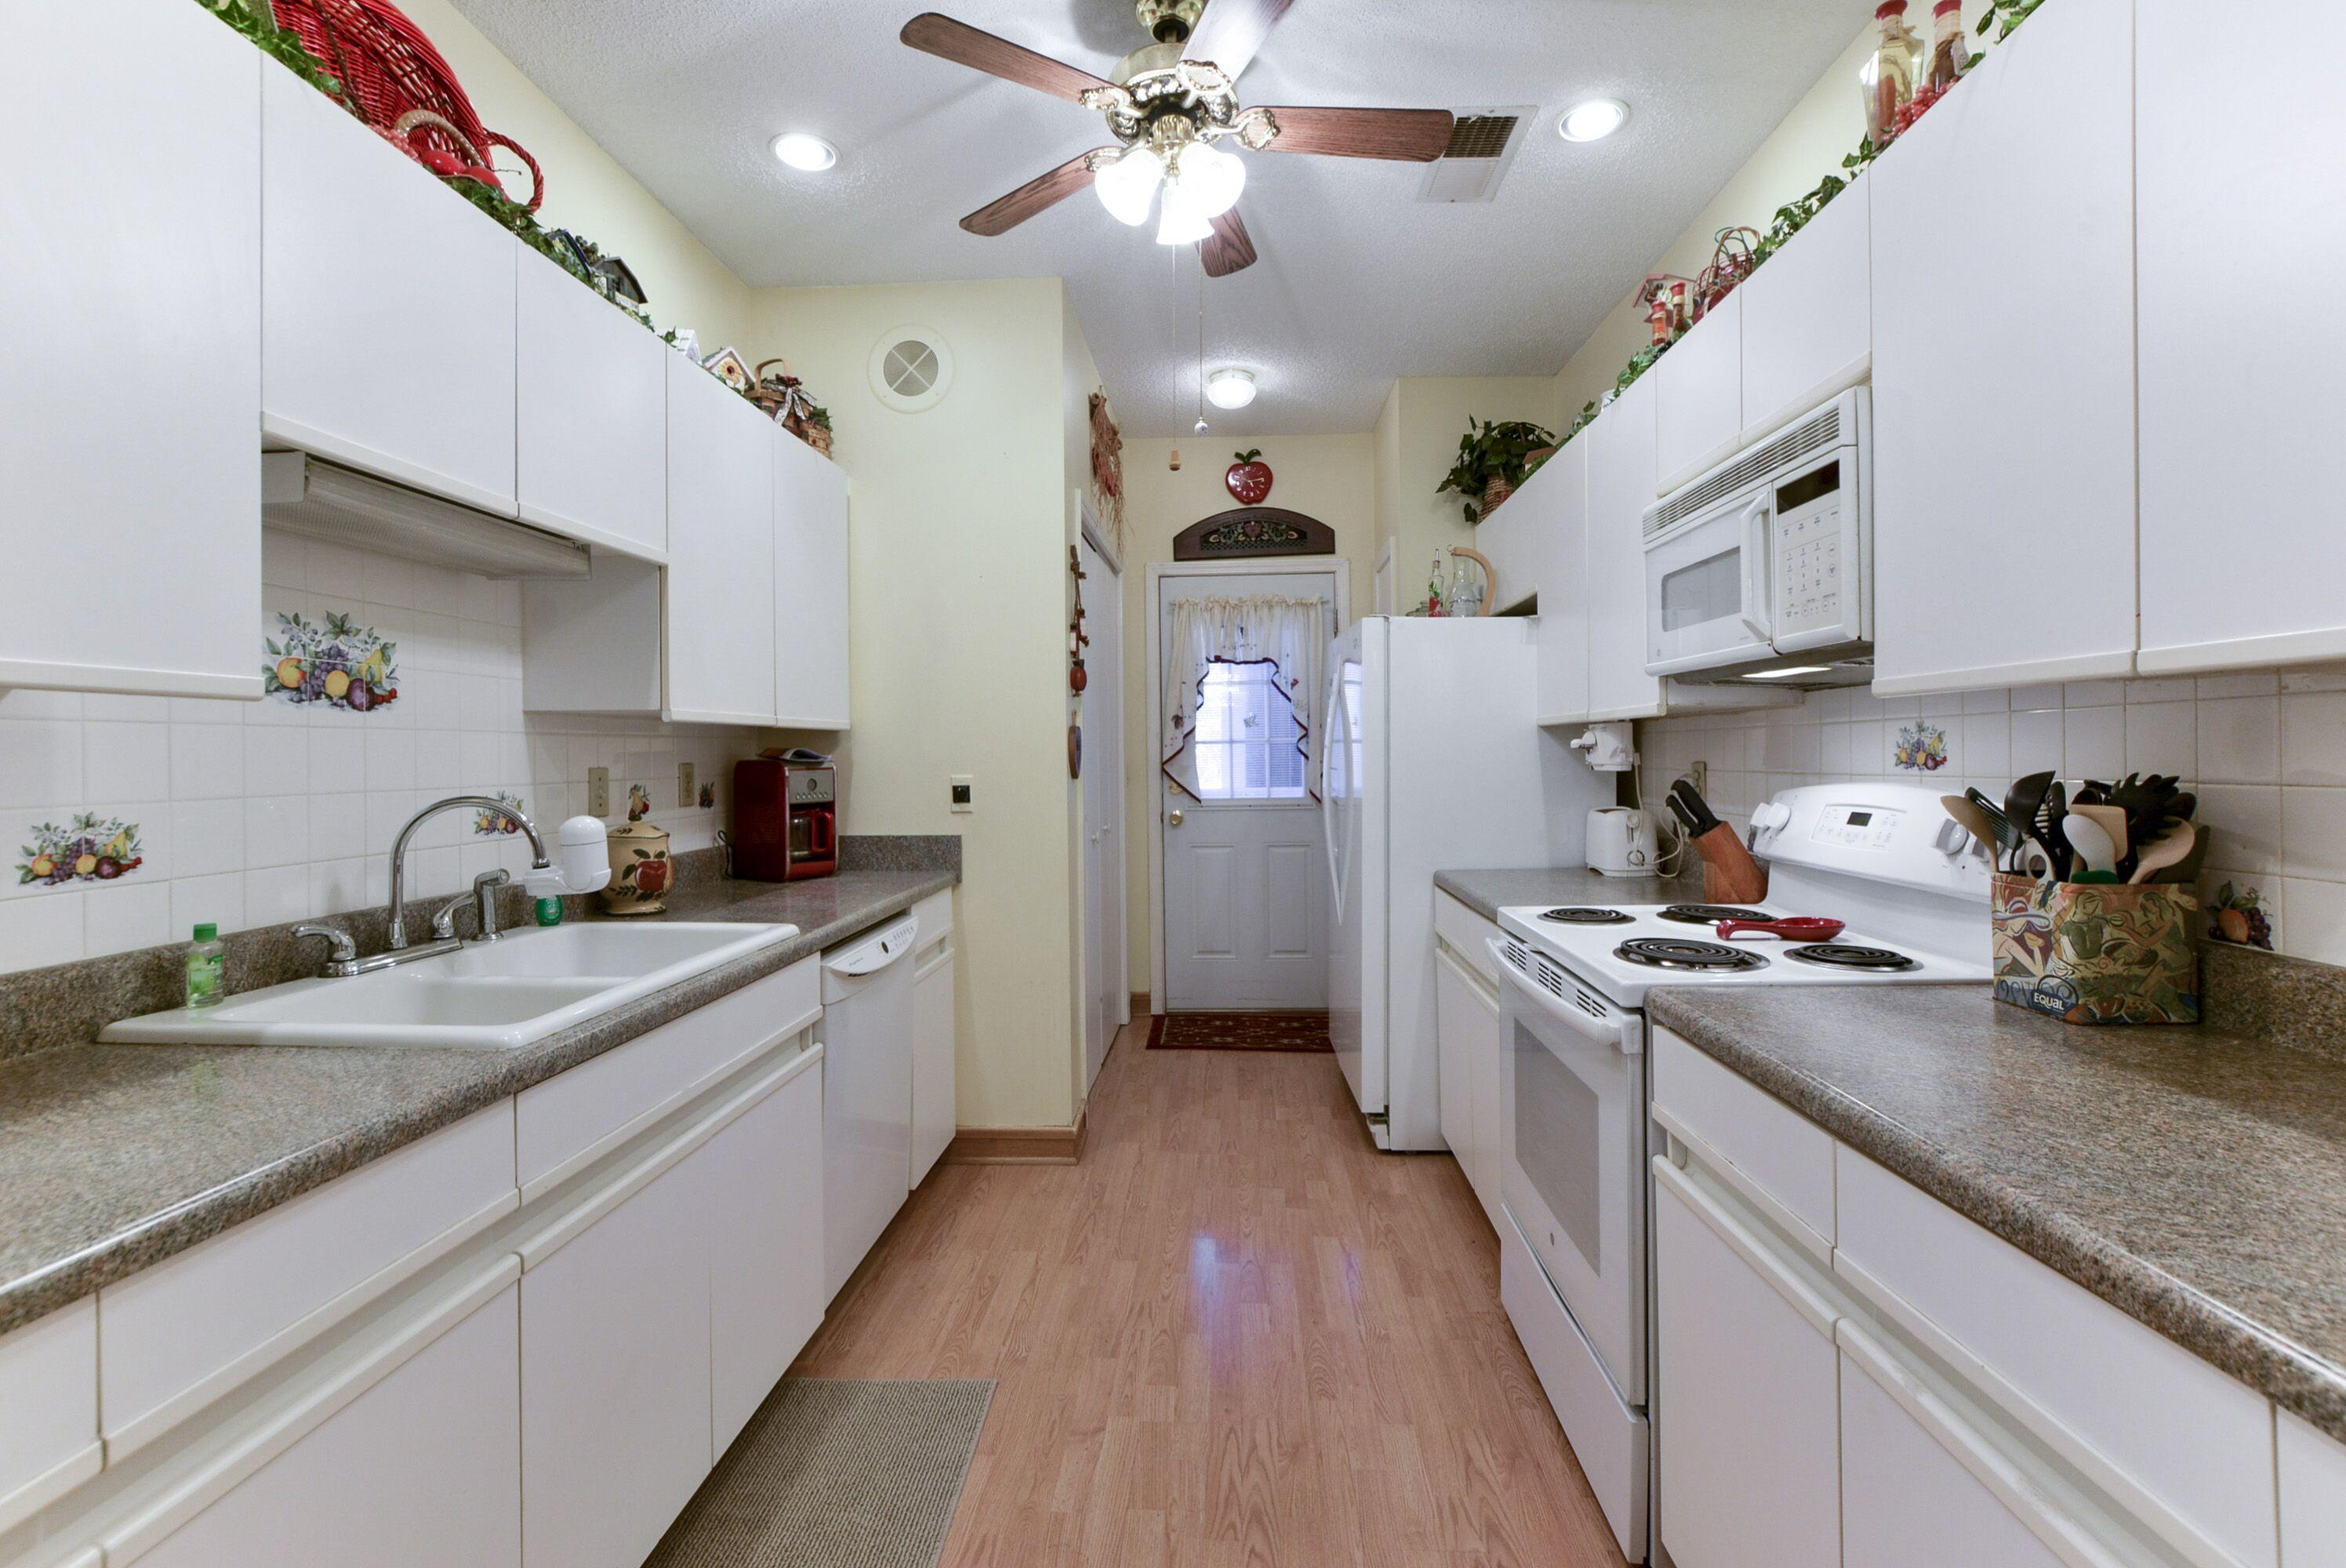 280 Ld Woodland Drive Branson, MO 65616